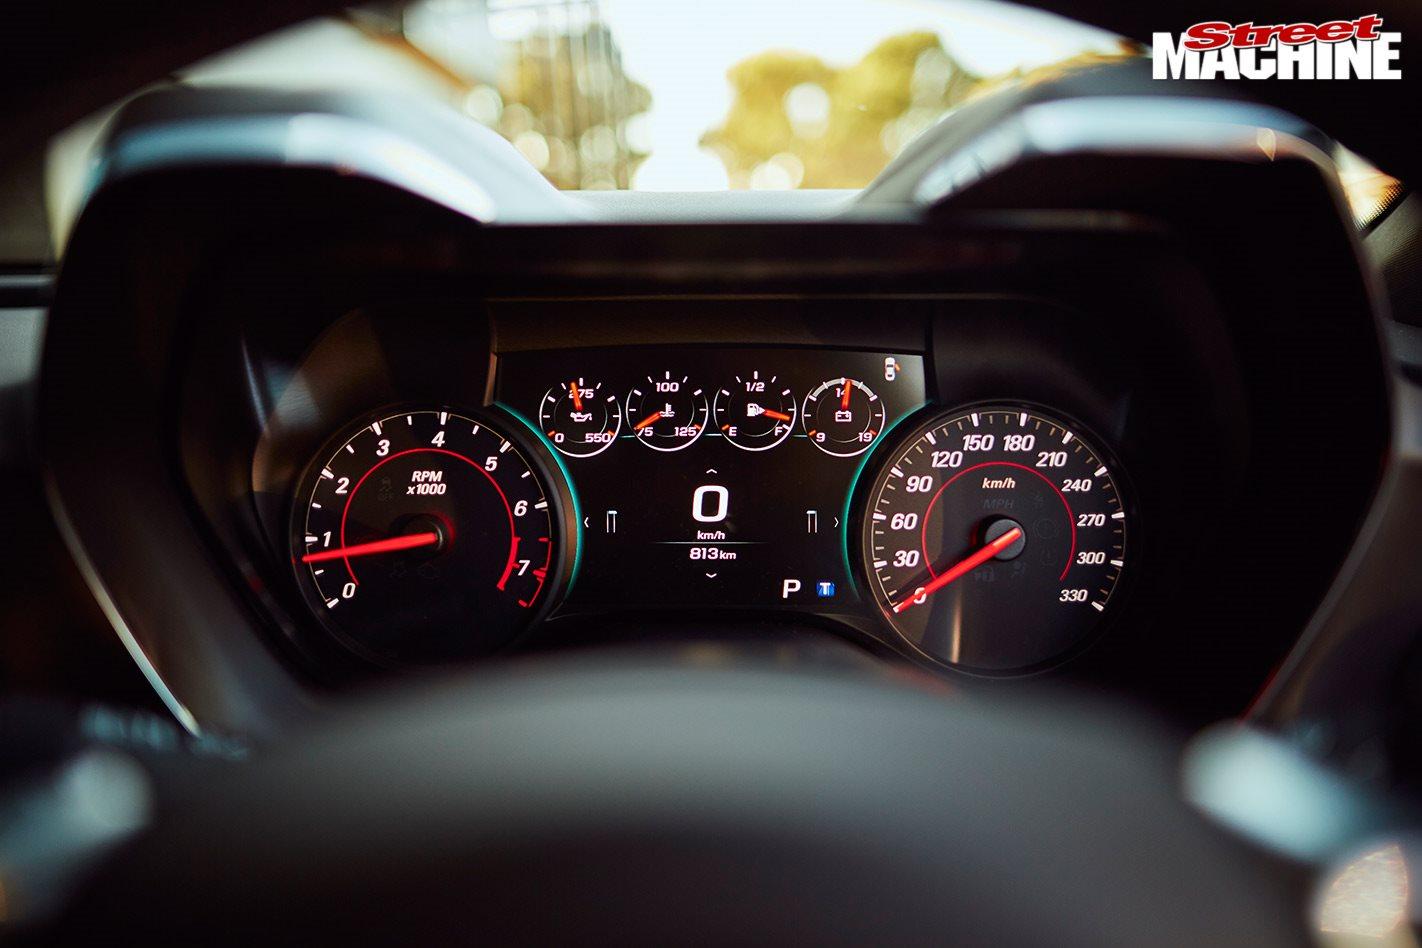 HSV Camaro road test – Video